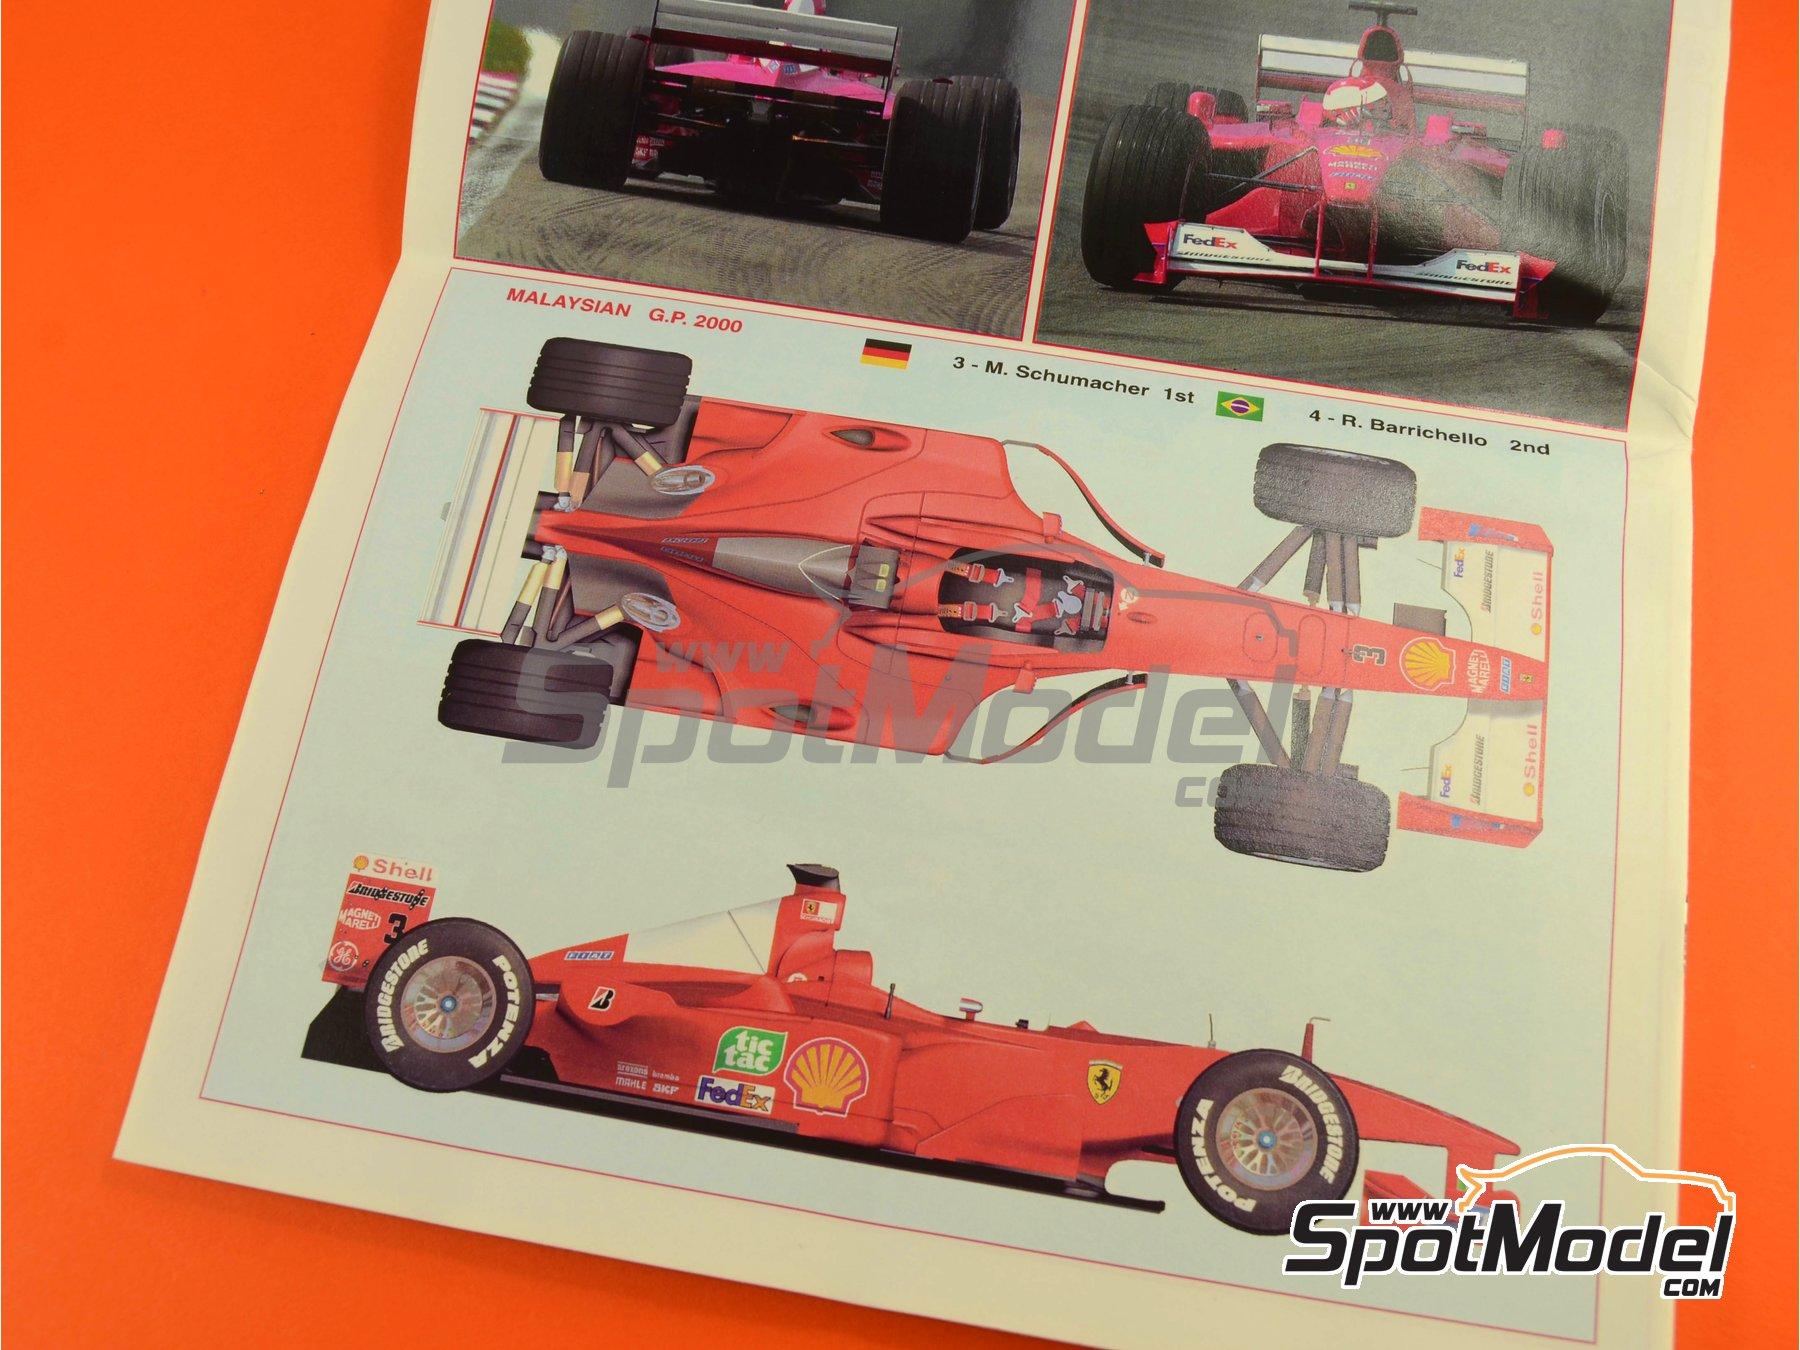 Image 18: Ferrari F1 2000 Marlboro - Gran Premio de Fórmula 1 de Malasia 2000 | Maqueta de coche en escala1/24 fabricado por Tameo Kits (ref.TLK002)